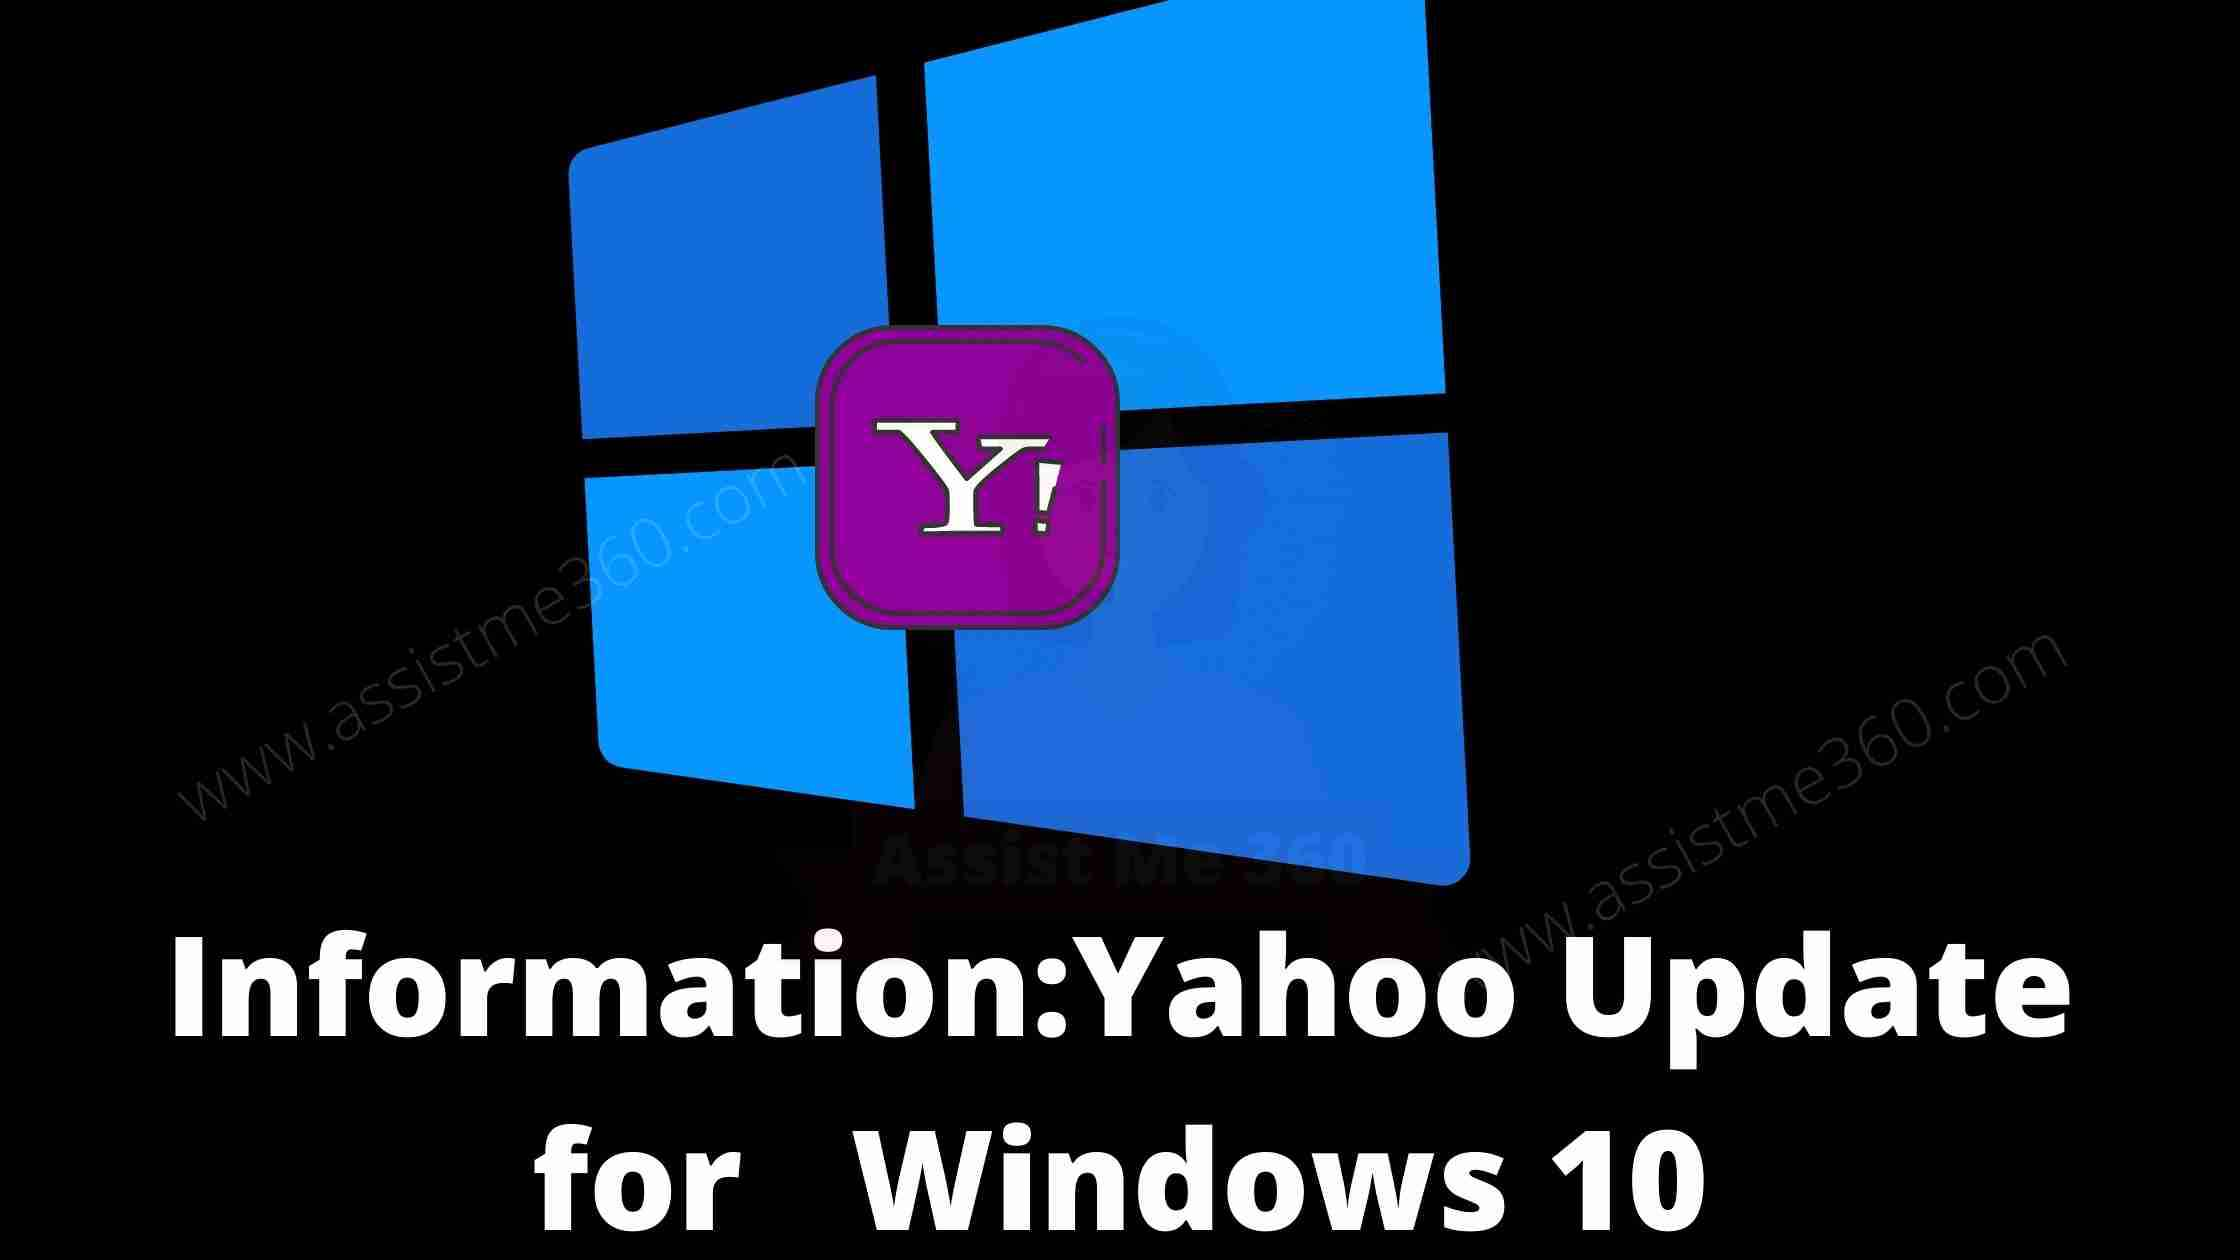 Yahoo Update for Windows 10